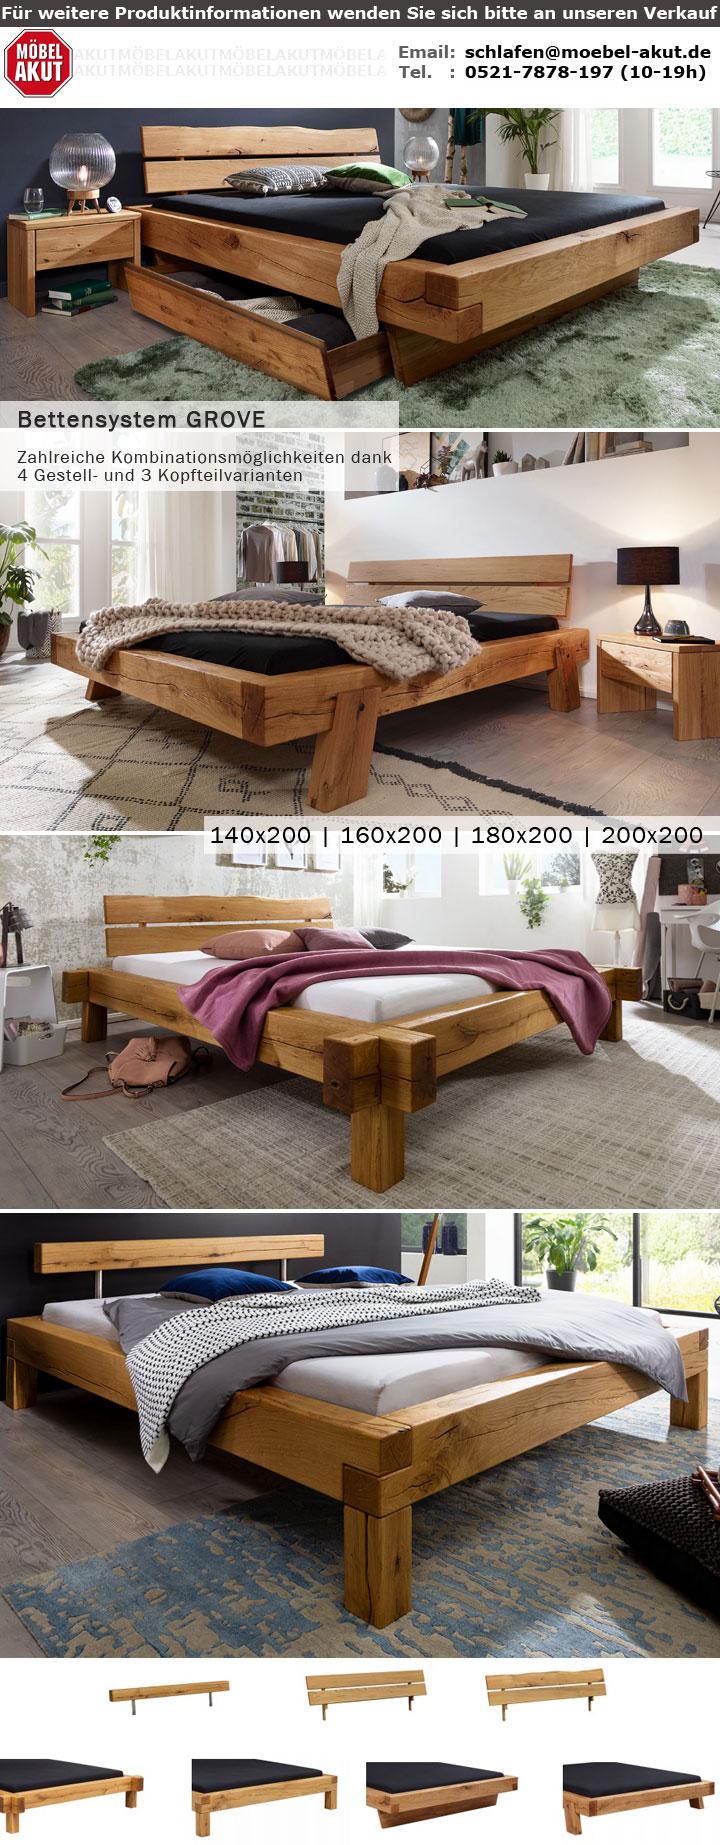 Bettensystem GROVE